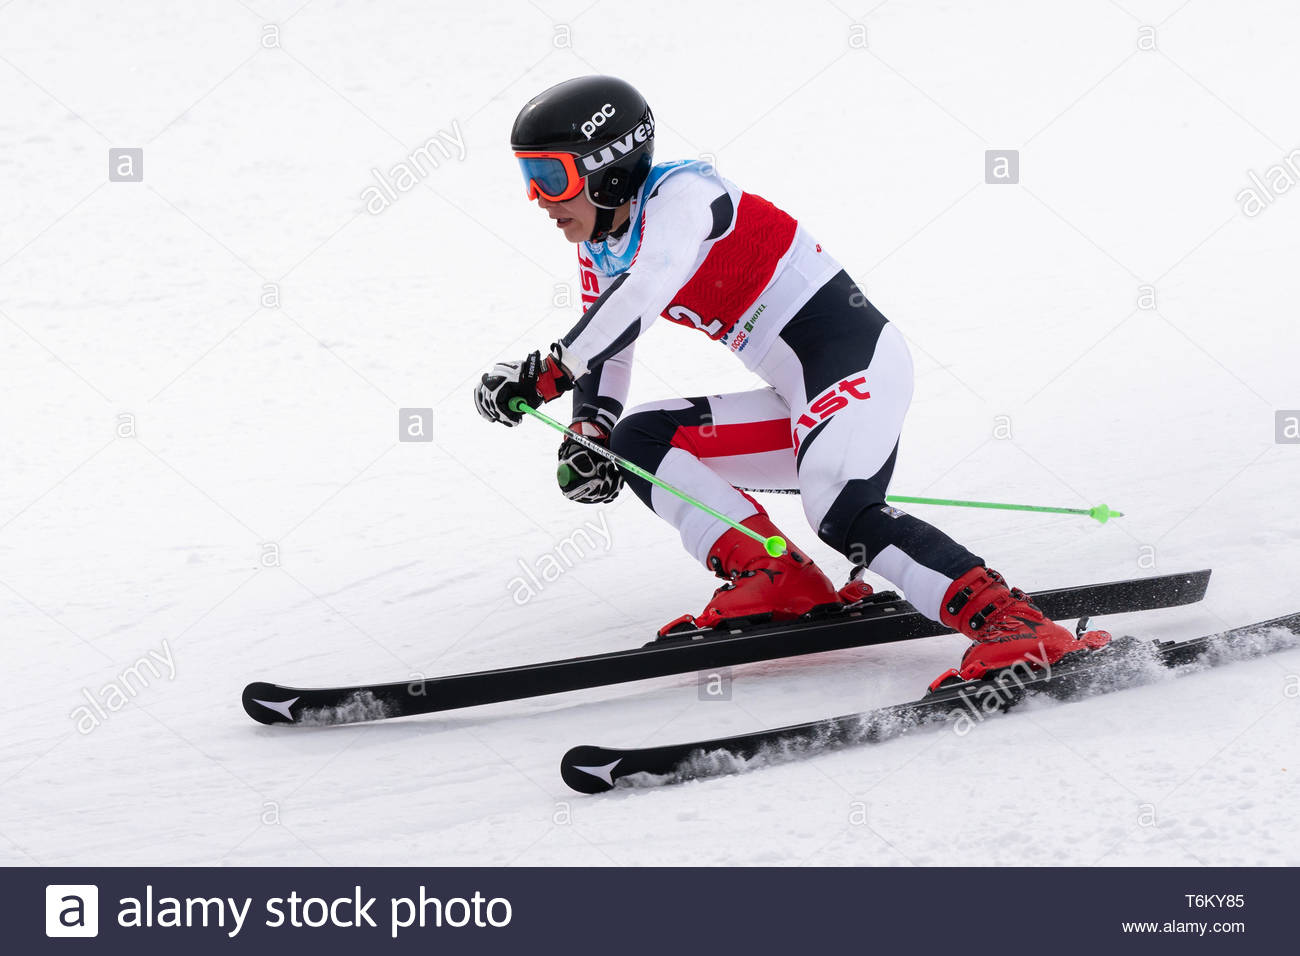 KAMCHATKA, RUSSIA - APR 2, 2019: Mountain skier Elizaveta Timchenko (Kamchatka Peninsula) skiing down mount. International Ski Federation Championship - Stock Image